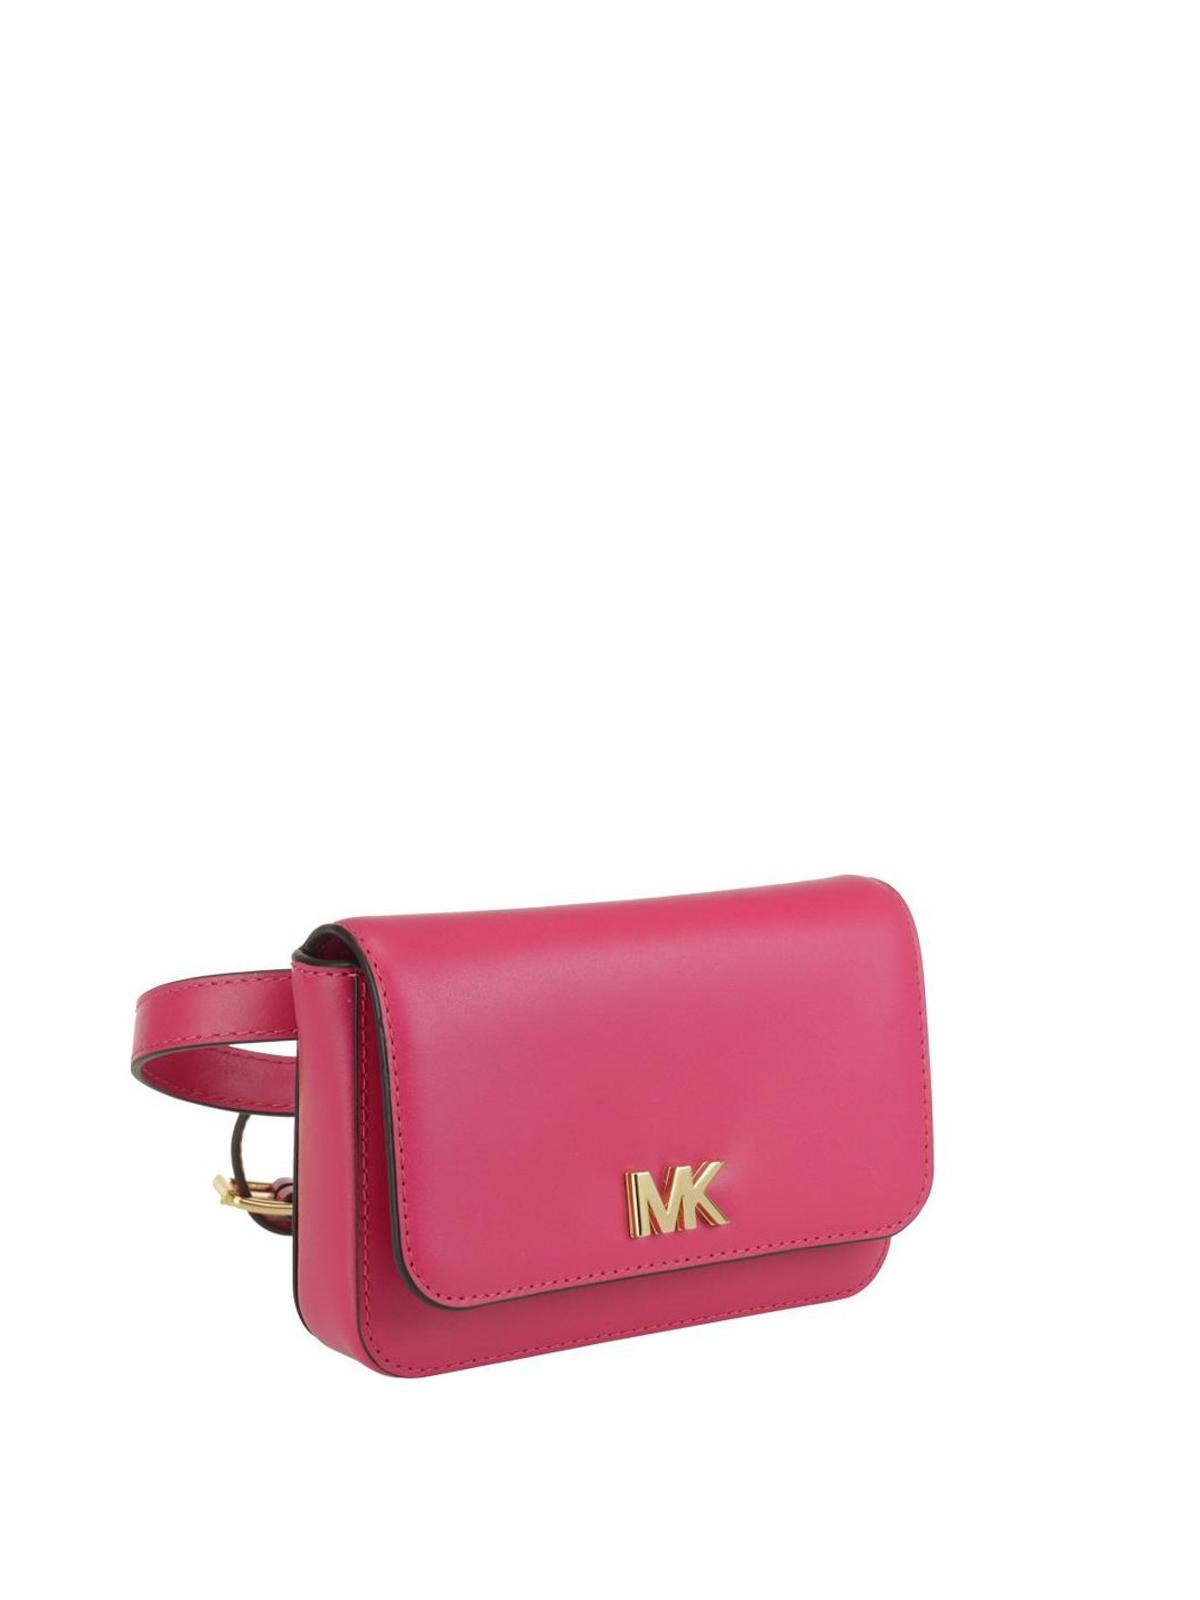 7eb6bcbd95c7 Michael Kors - Mott pink leather belt bag - belt bags - 30S8GOXN1L564